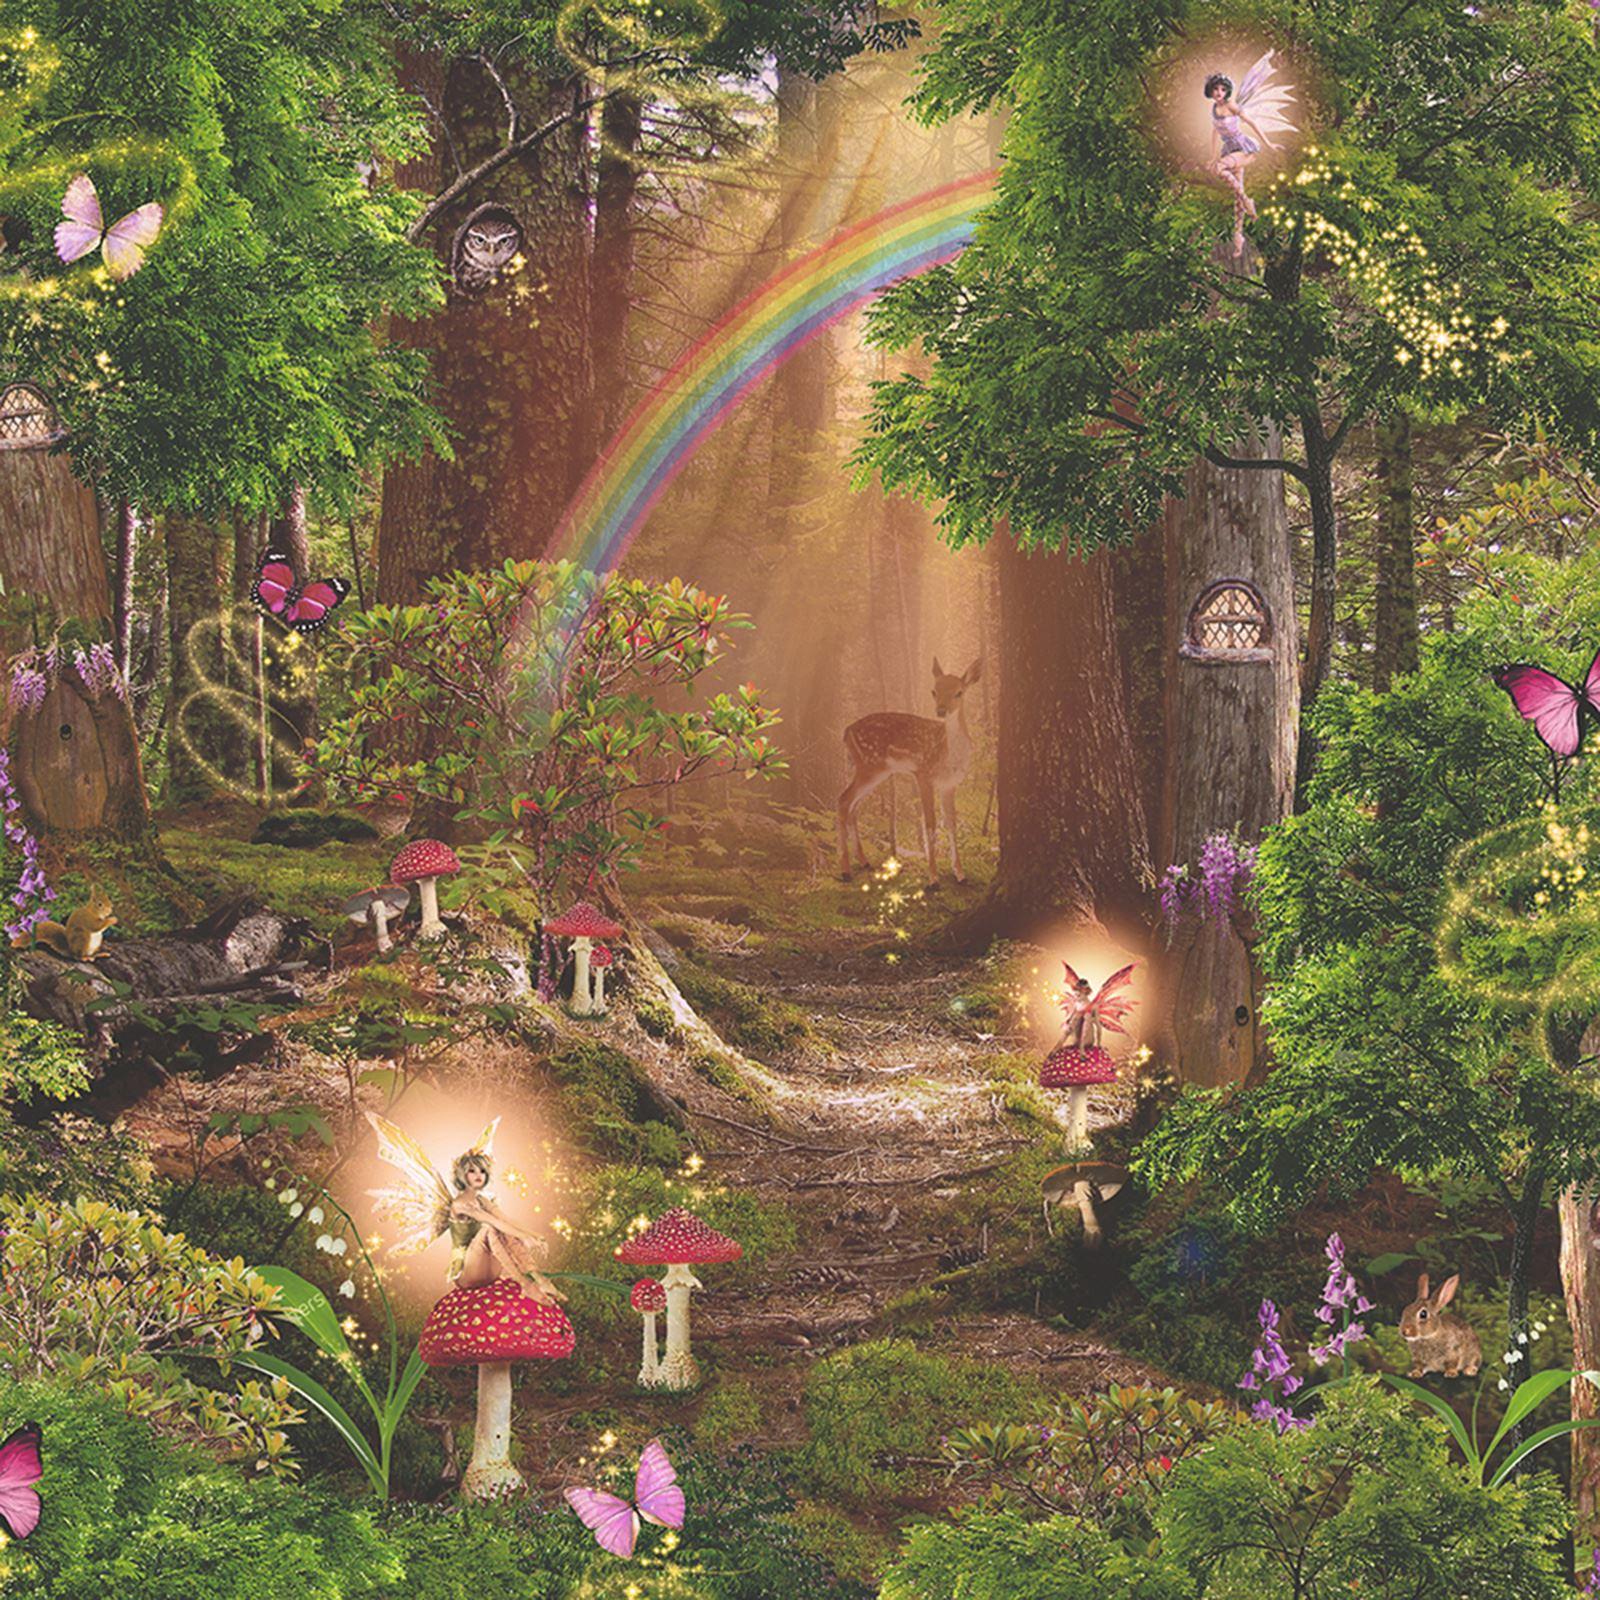 Magic fairy garden wallpaper arthouse 696009 fairies new for Arthouse jardin wallpaper